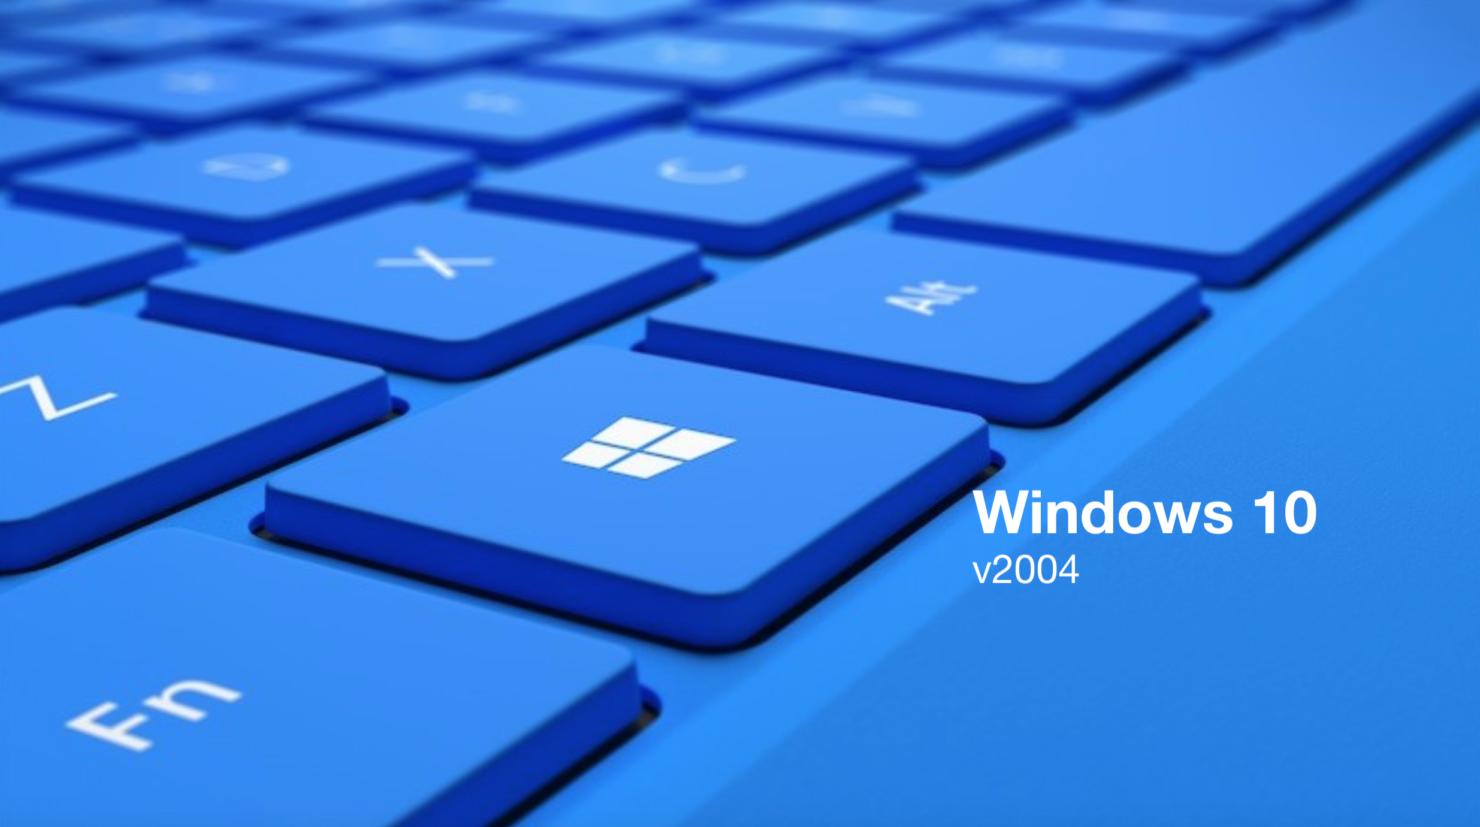 windows 10 iso 2004 Windows 10 version 2004 windows 10 may 2020 update windows 10 version 2004